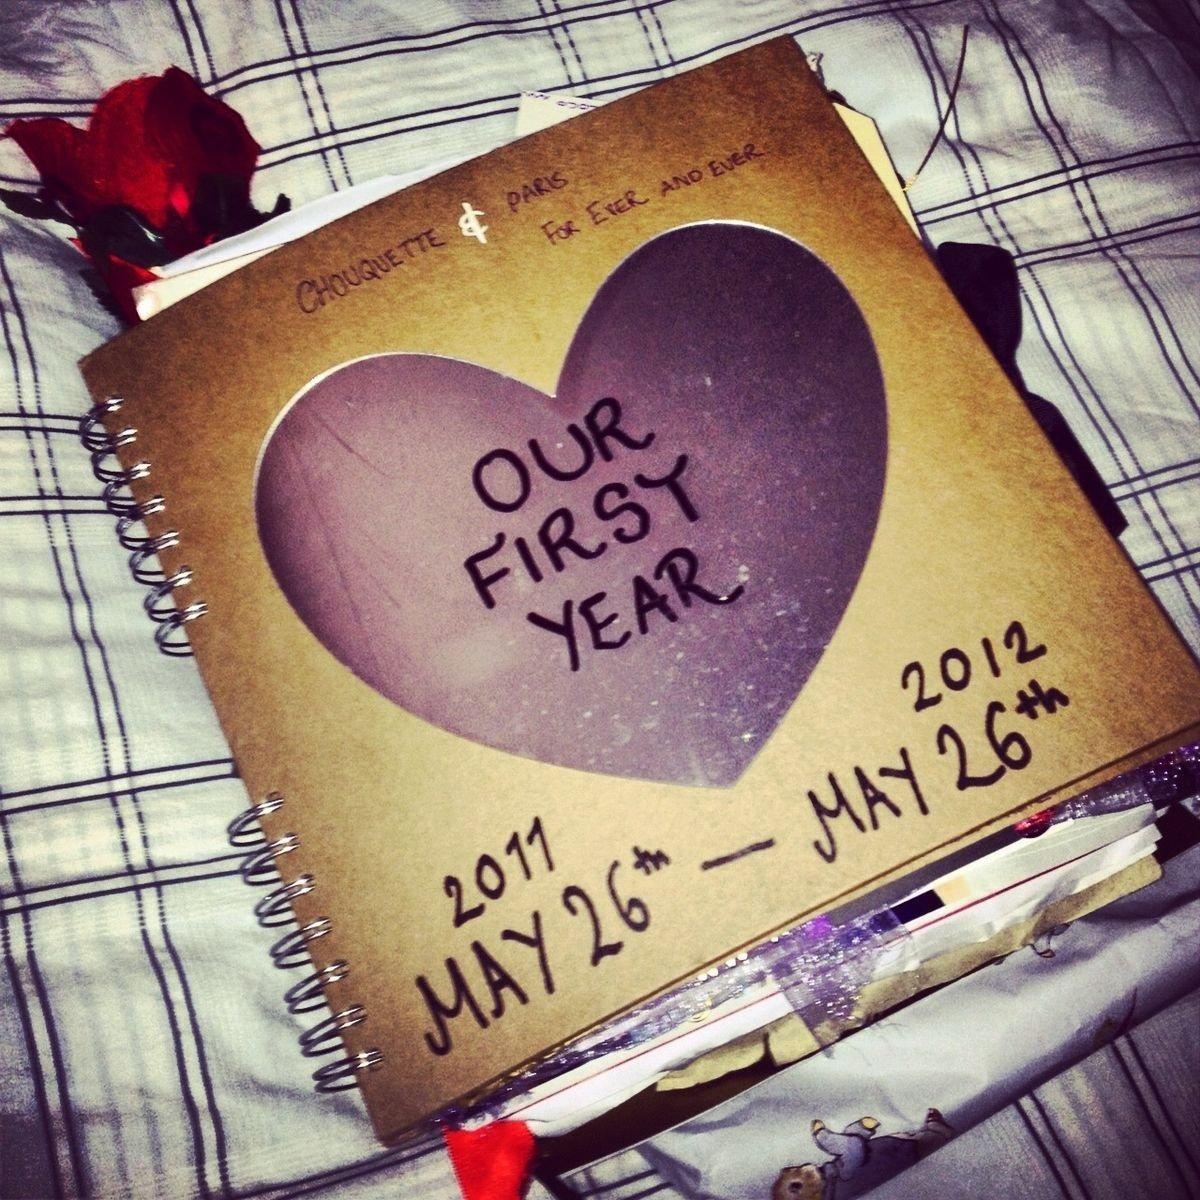 10 Trendy Cute Ideas For Your Boyfriend For Christmas 5 gifts to get your boyfriend this christmas relationships goal